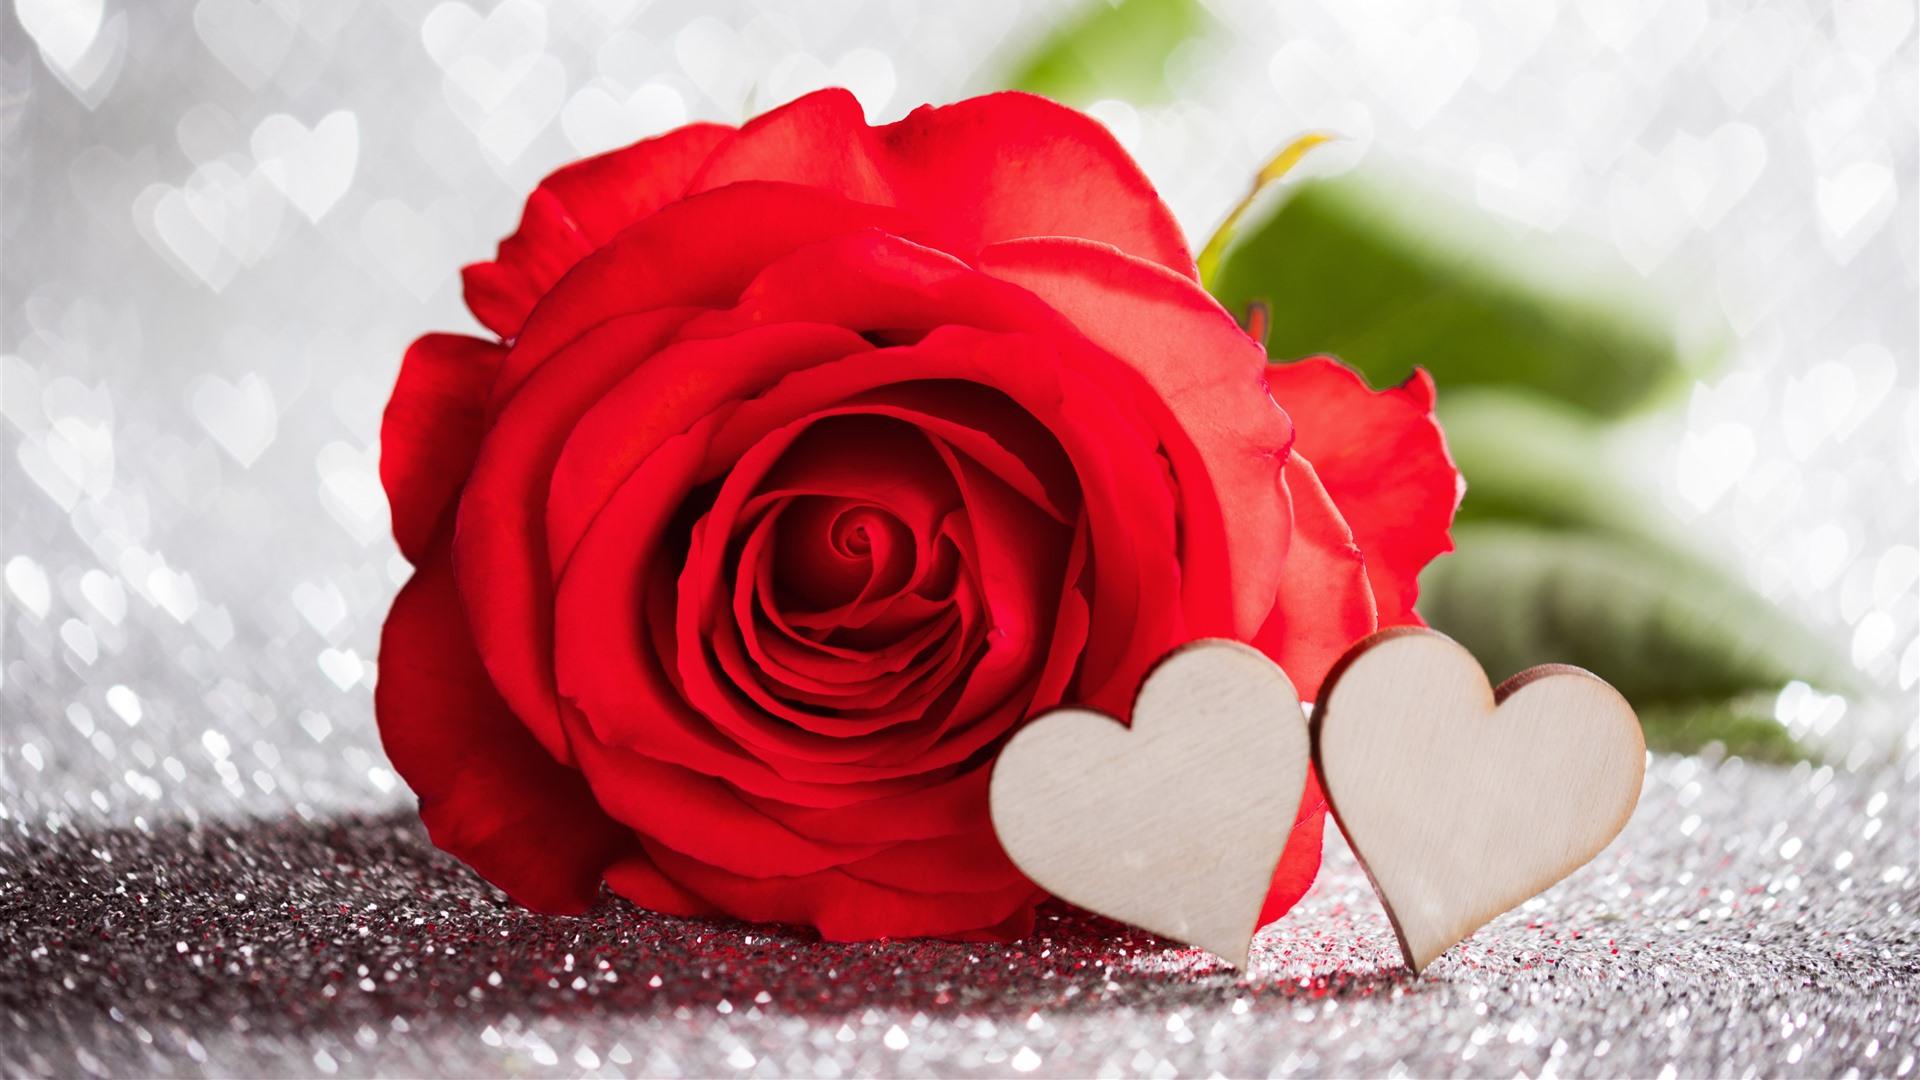 Wallpaper Red Rose Love Hearts Hazy Romantic 5120x2880 Uhd 5k